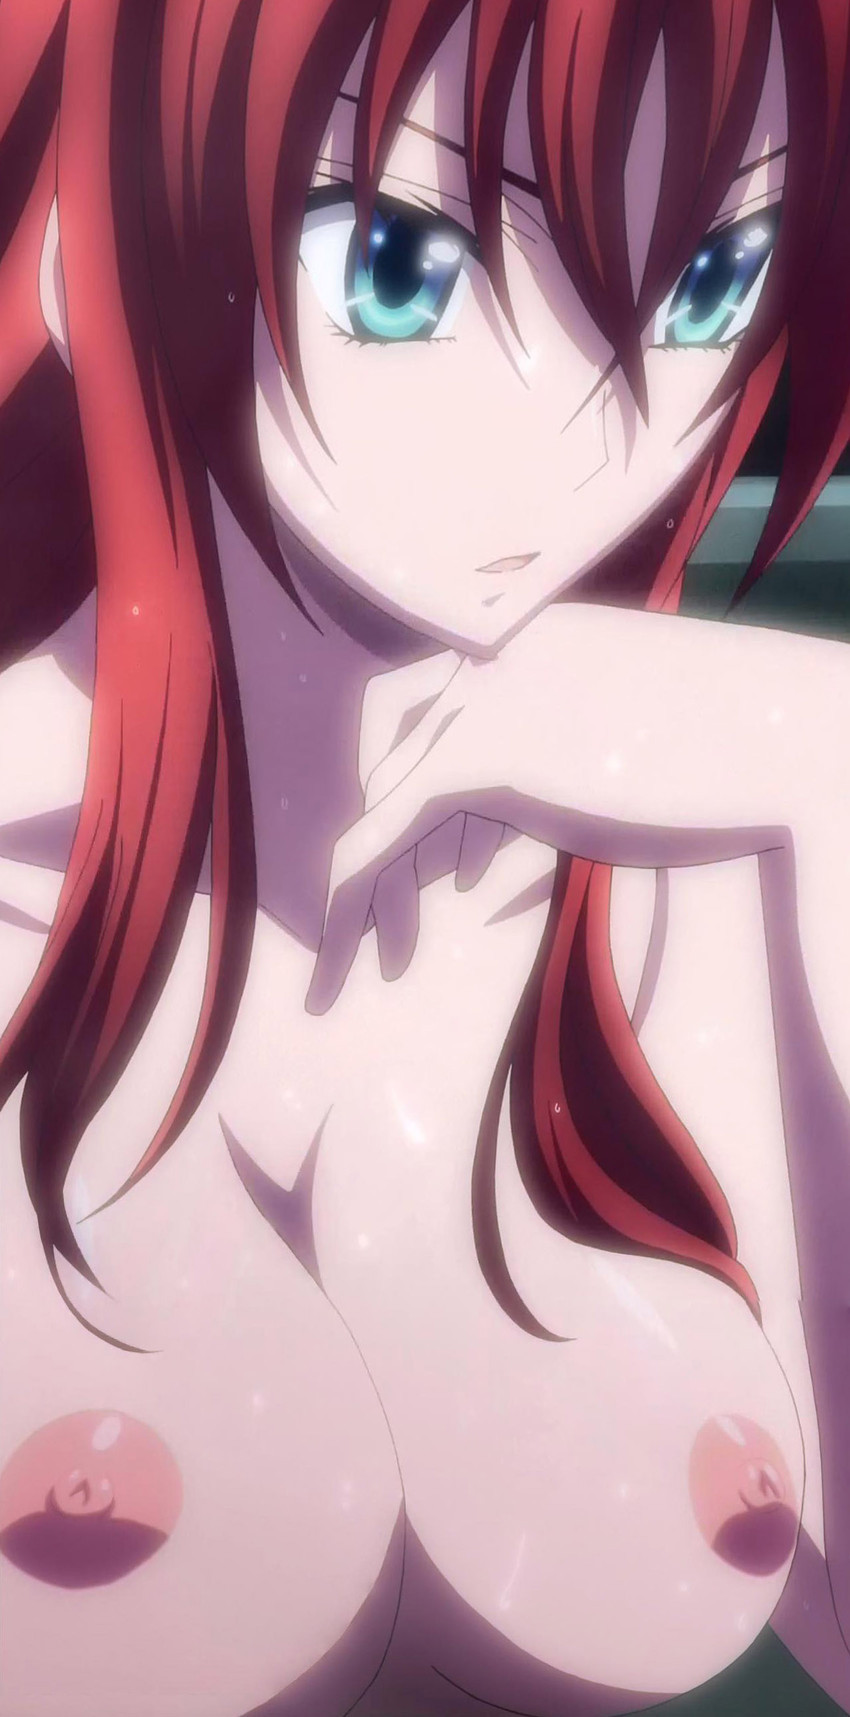 Rias Gremory Nude